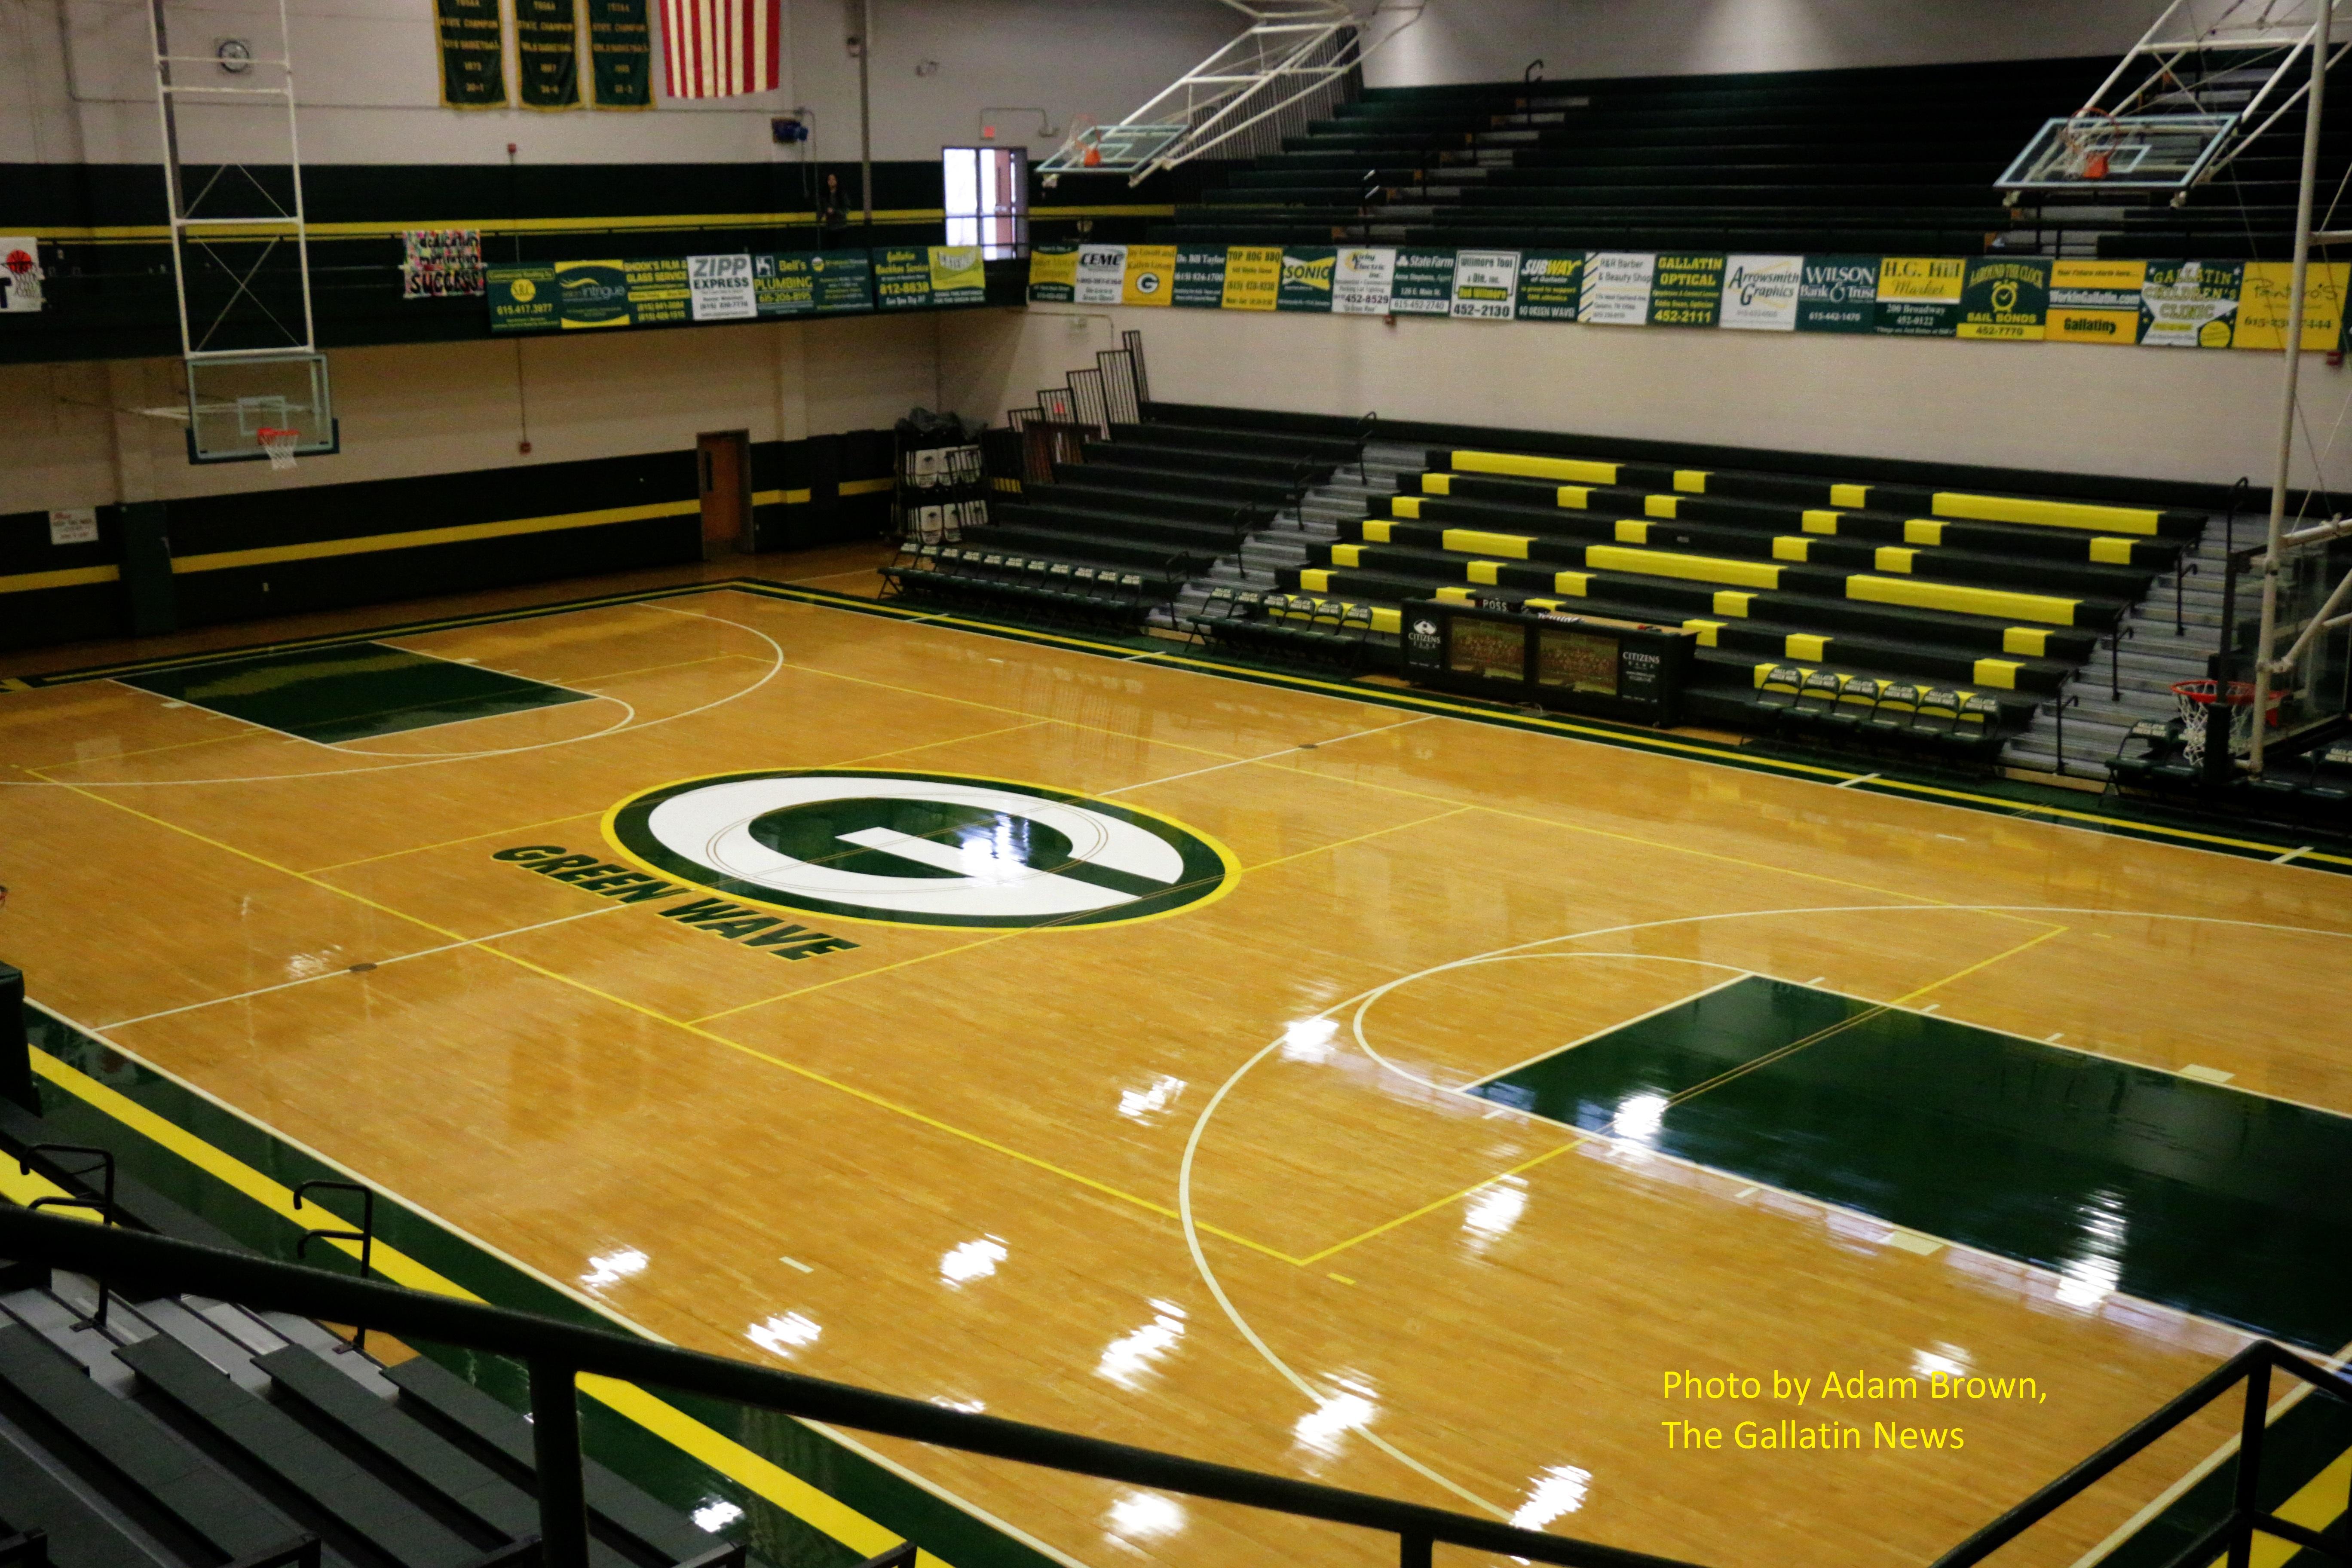 Gallatin High School to Host Region 5-AAA Basketball Tournament (Updated 2/22/19)